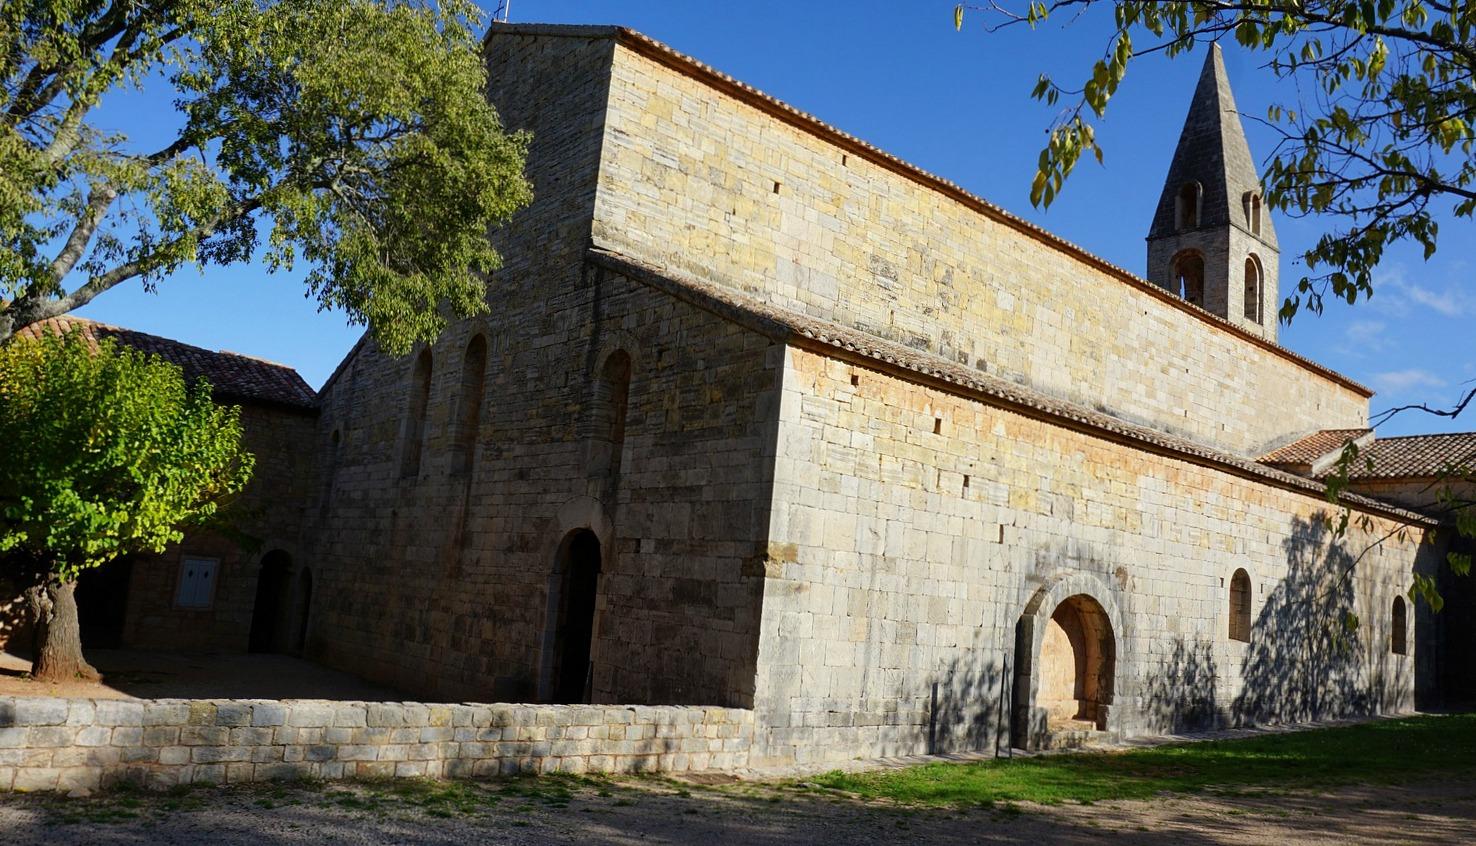 Le Thoronet Abbey